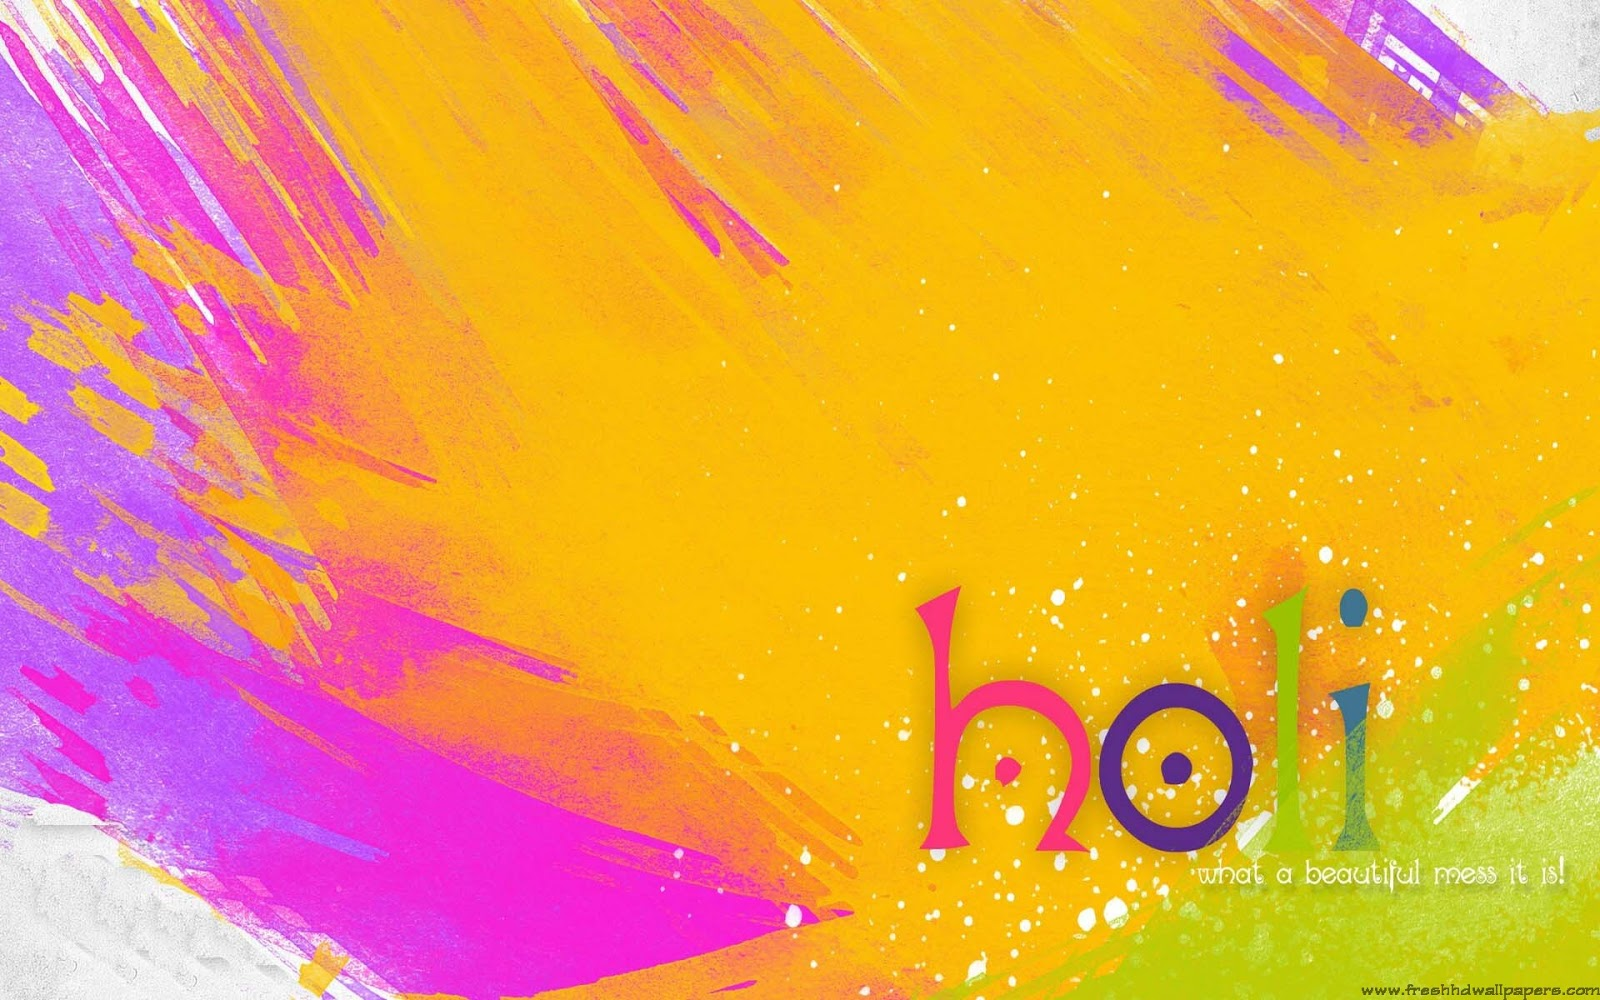 Fresh HD Wallpapers Happy Holi 2013   Fresh HD Wallpapers 1600x1000